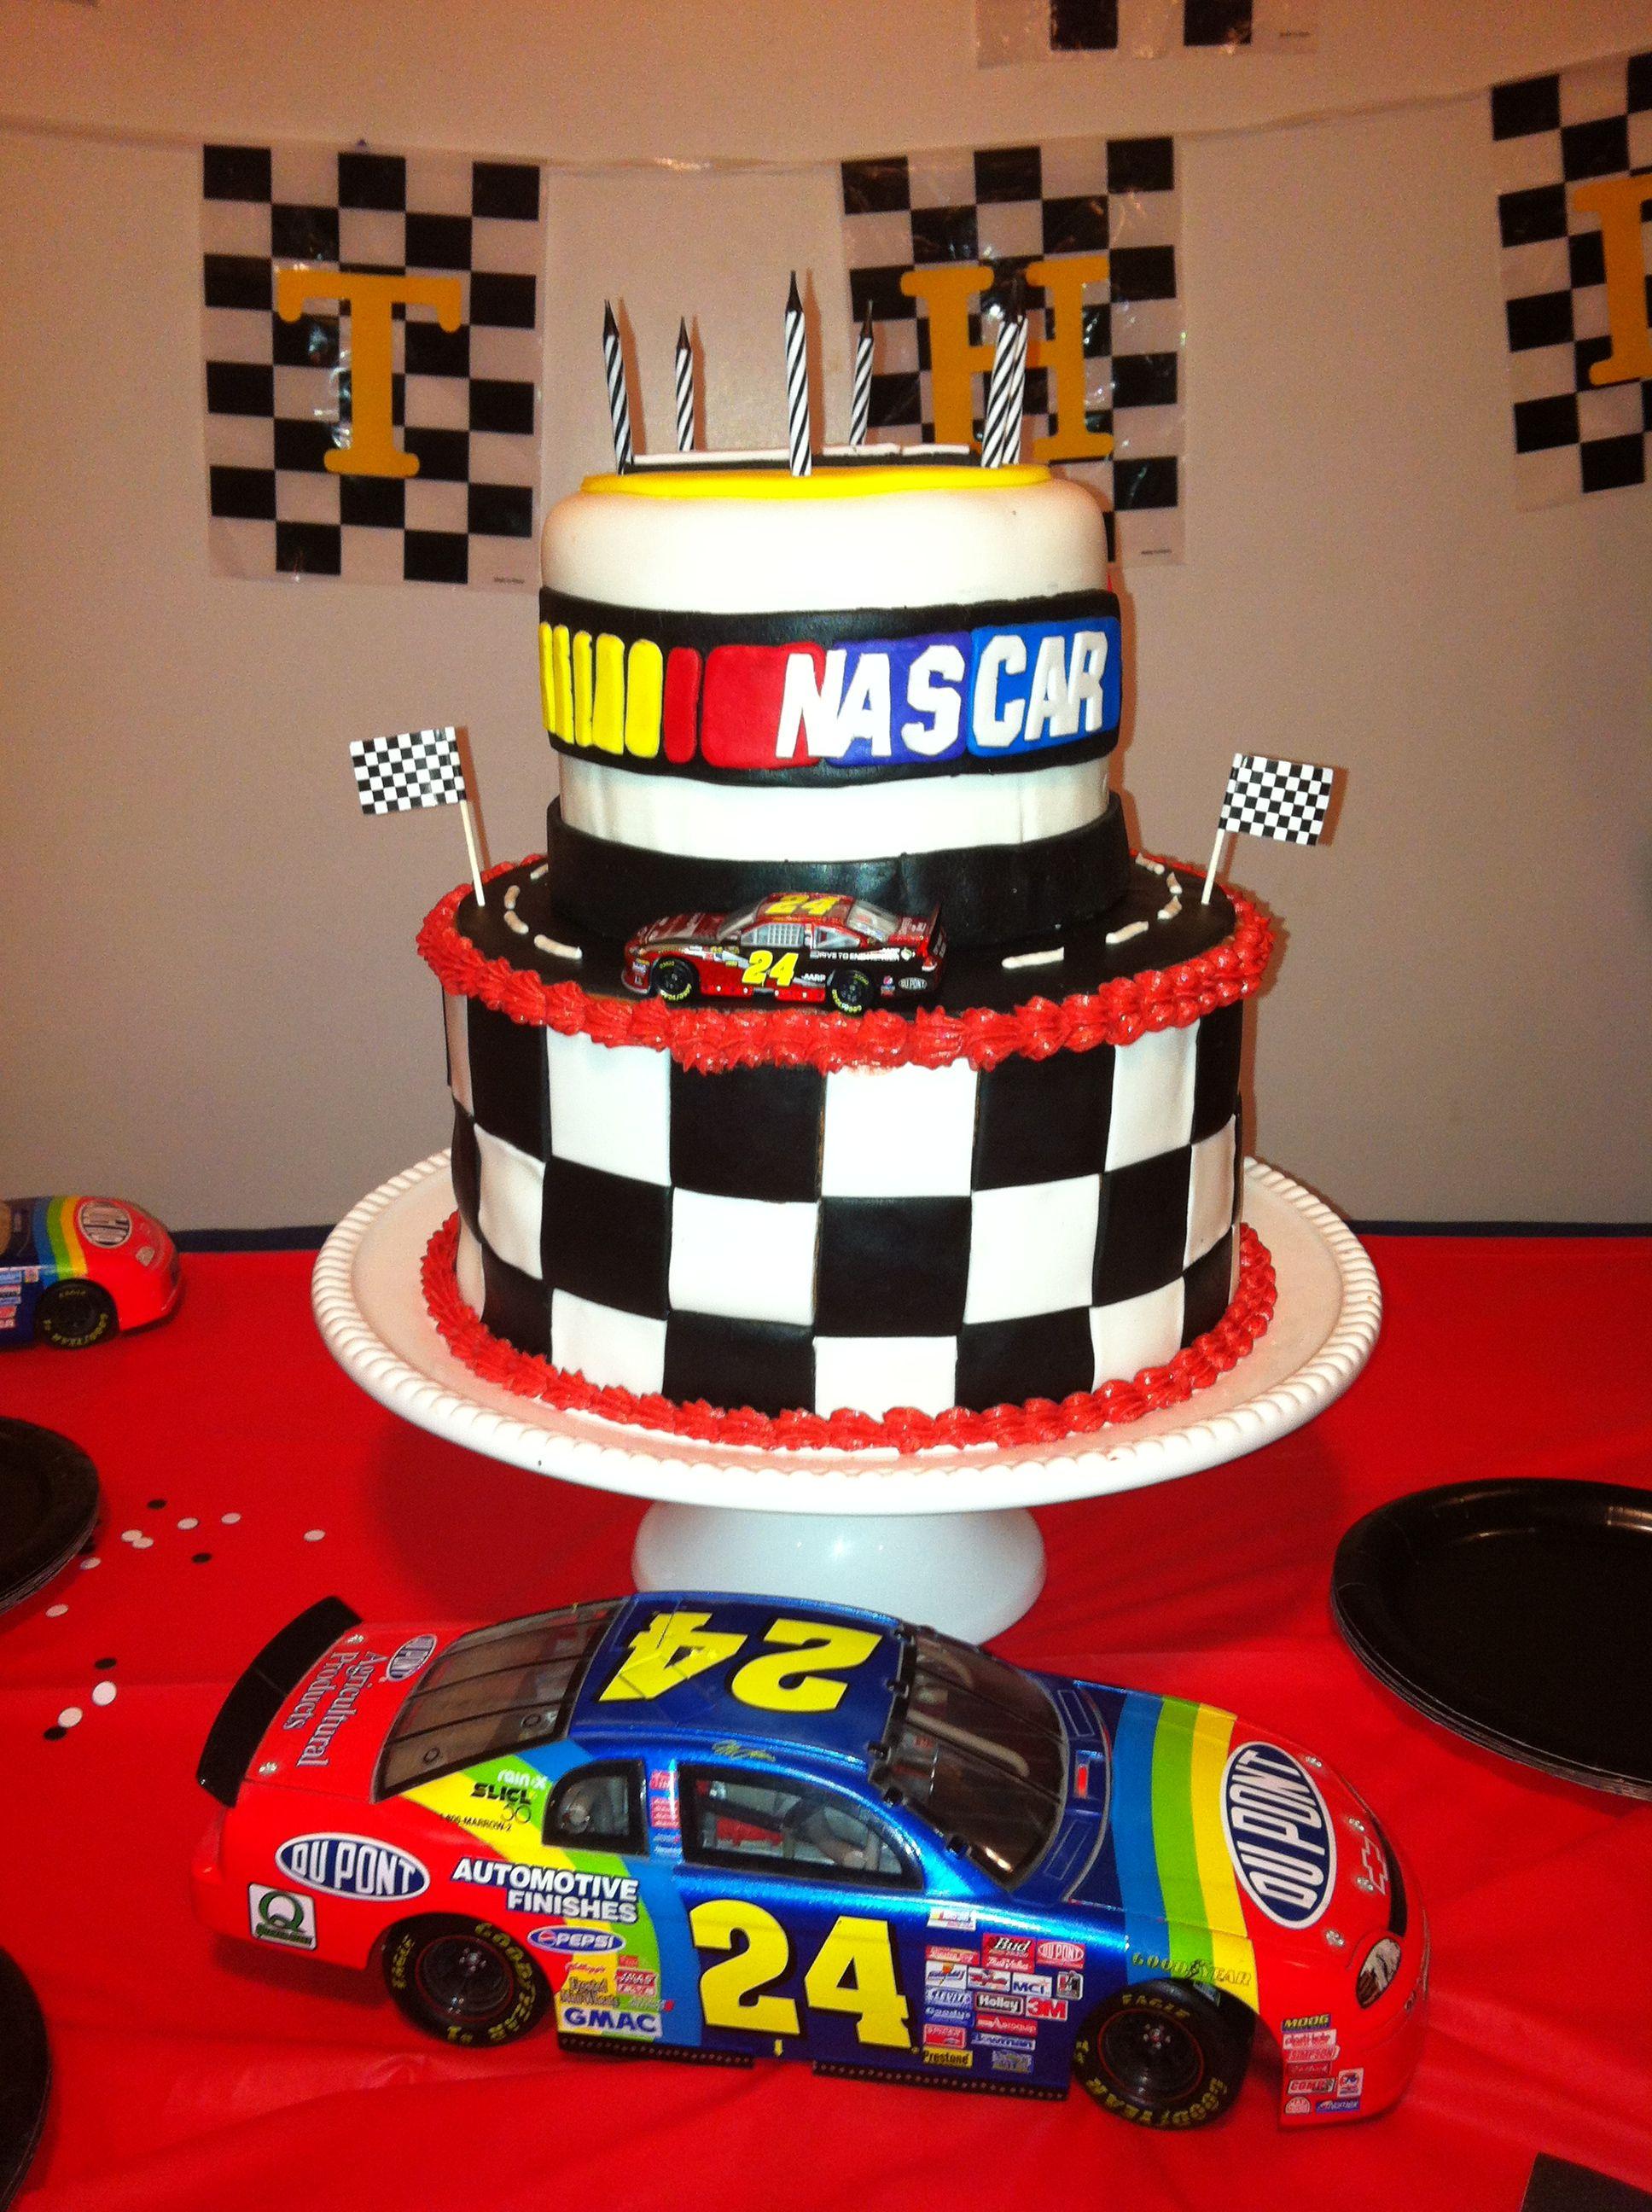 Nascar Cake Jeff Gordon Nascar By Madicakes Nascar Cake Car